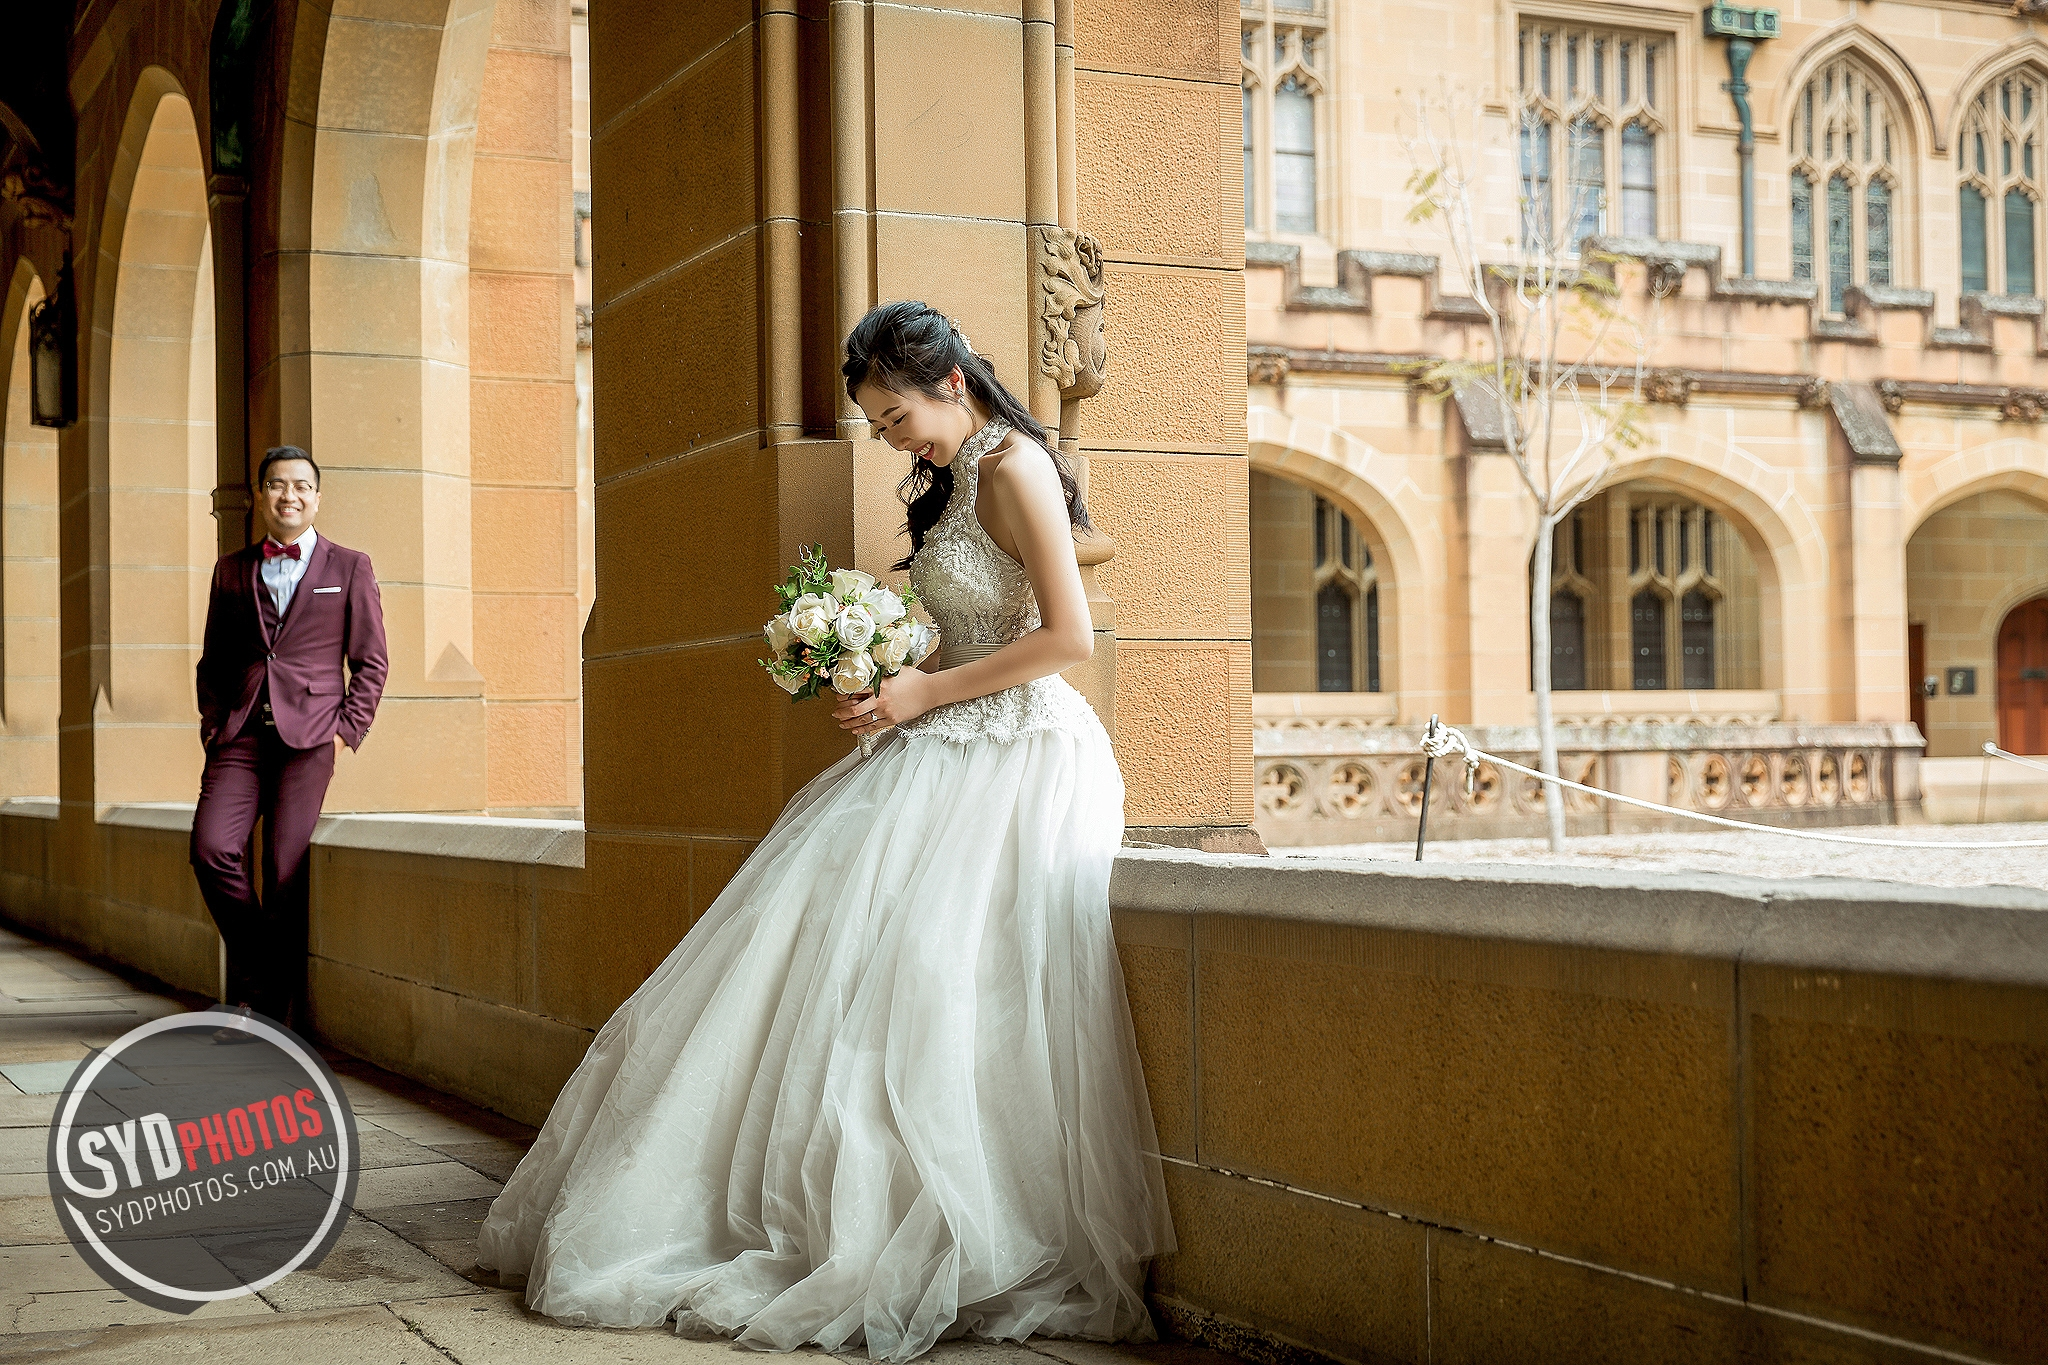 ID-104224-Hannah Zhang-Perwedding-婚纱照